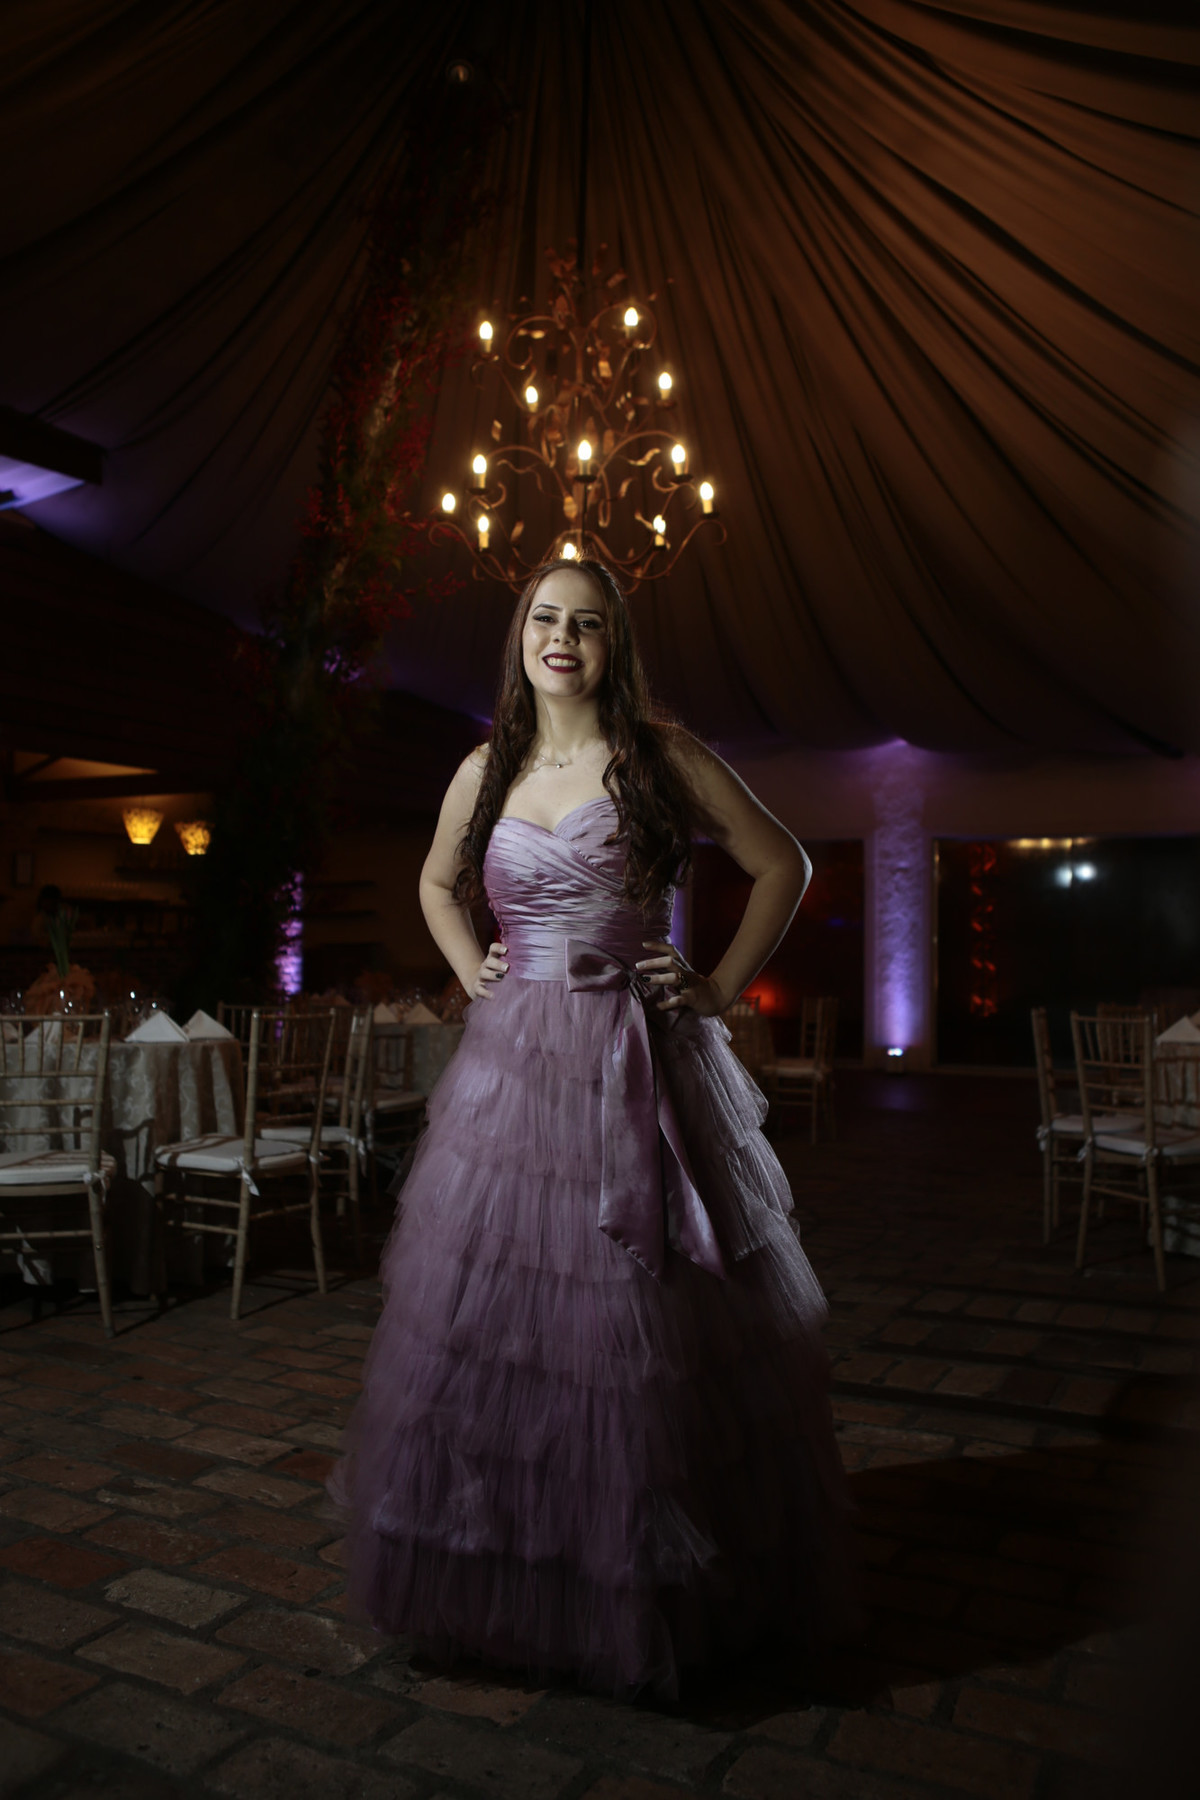 Aniversário da Fernanda D'avila no buffet grande ville